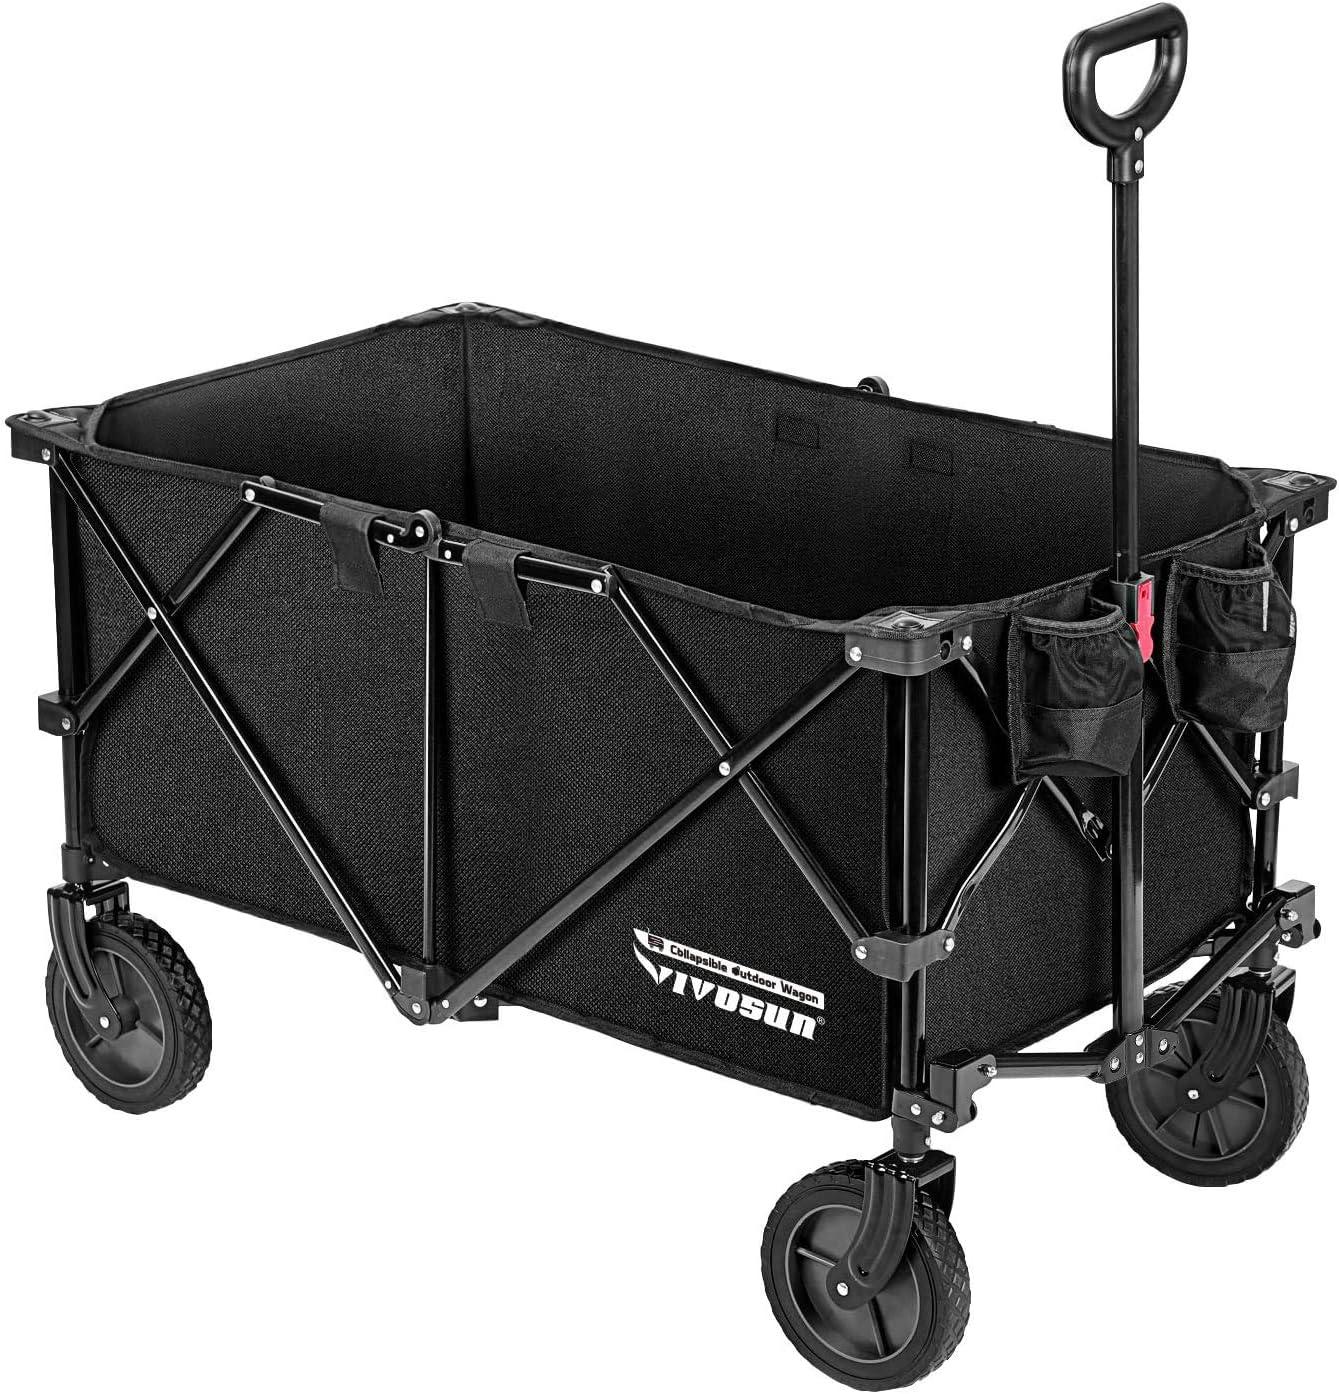 VIVOSUN Heavy Duty Collapsible Folding Wagon Utility Outdoor Camping Garden Cart with Universal Wheels & Adjustable Handle, Black : Patio, Lawn & Garden